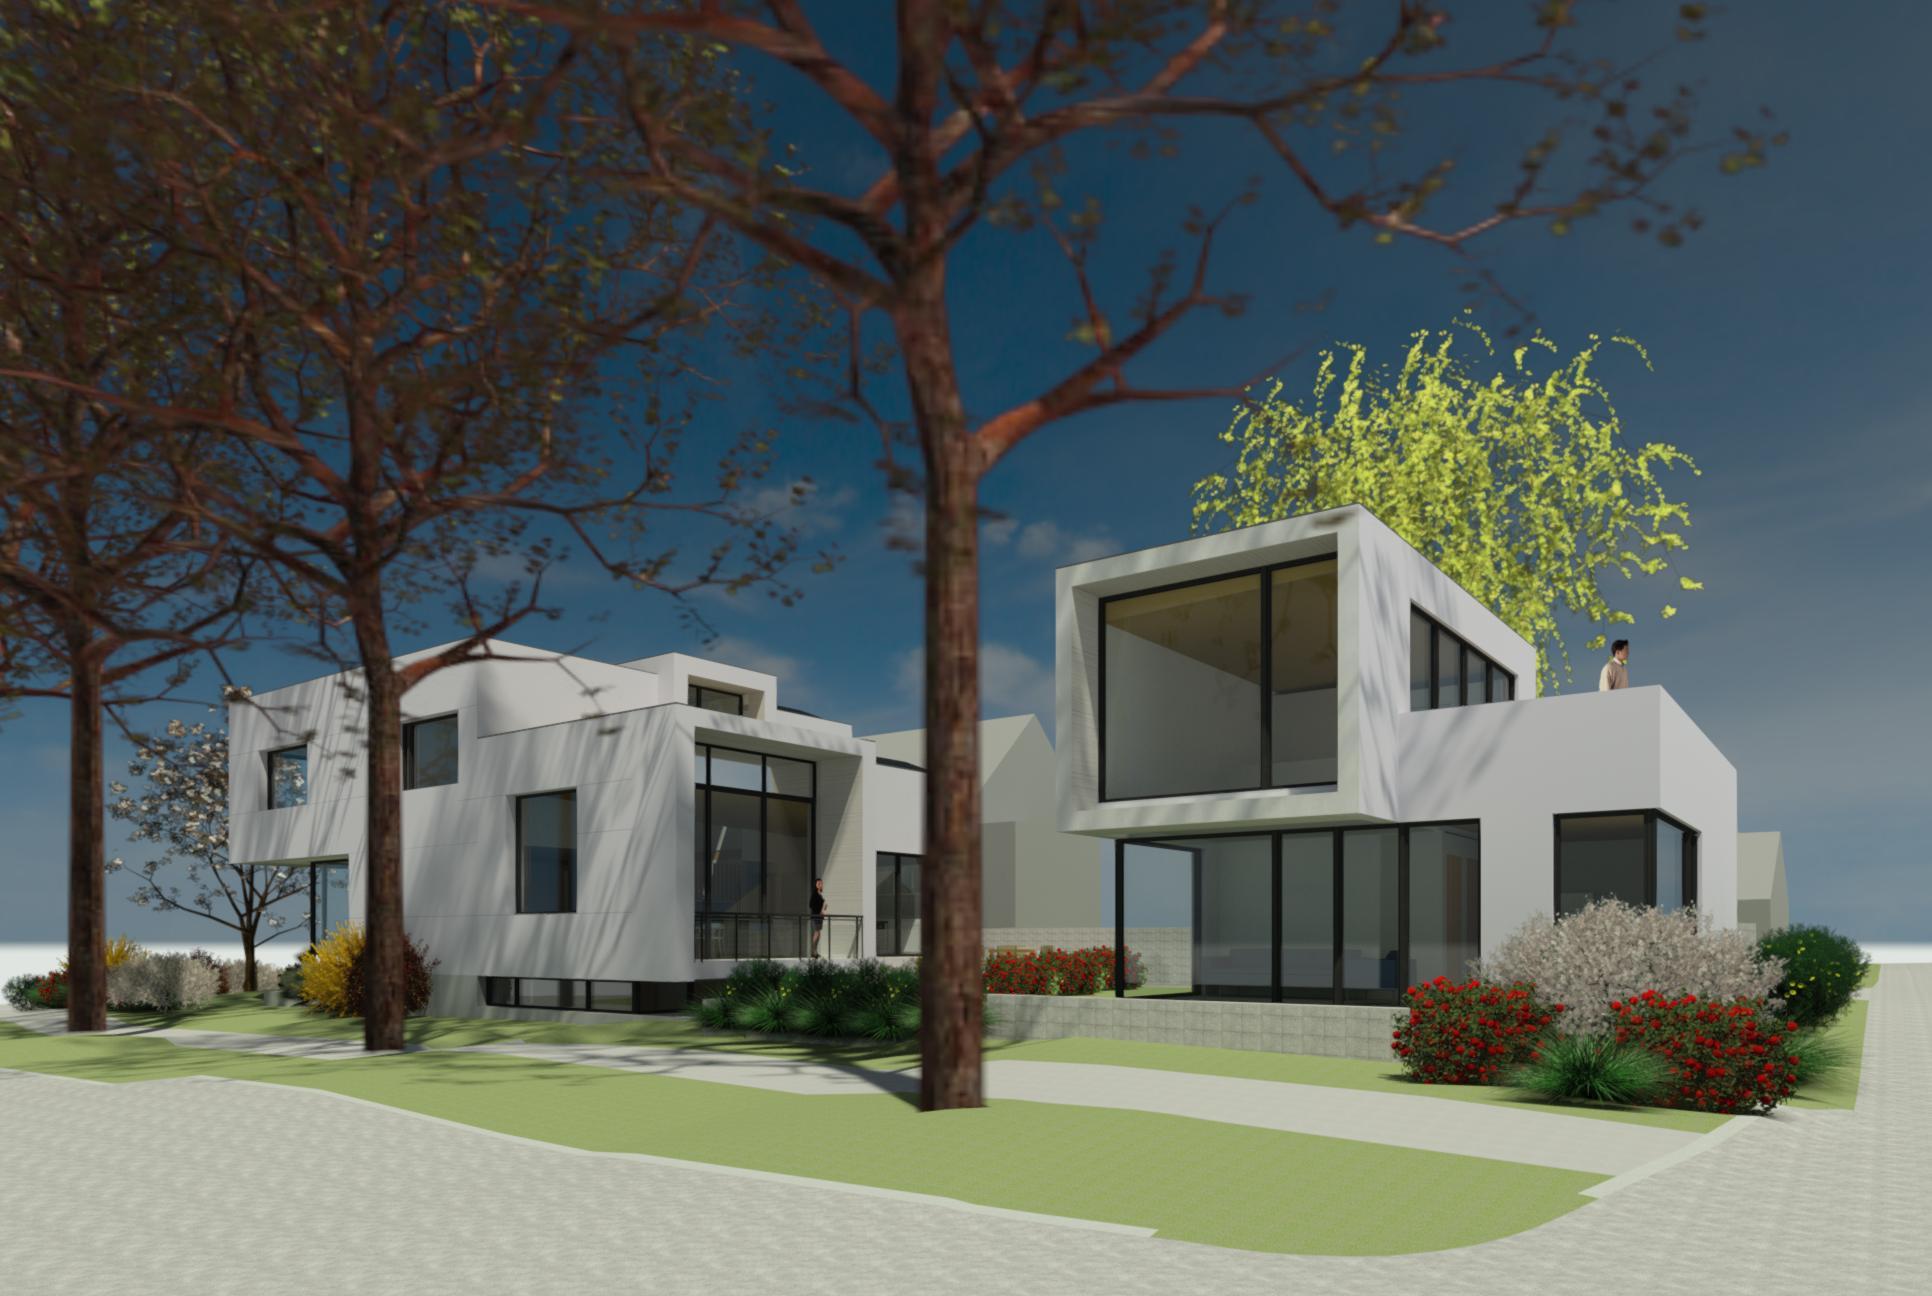 Vranakis Passive House & Laneway Home by Vincent Siu Architect Siu Architecture